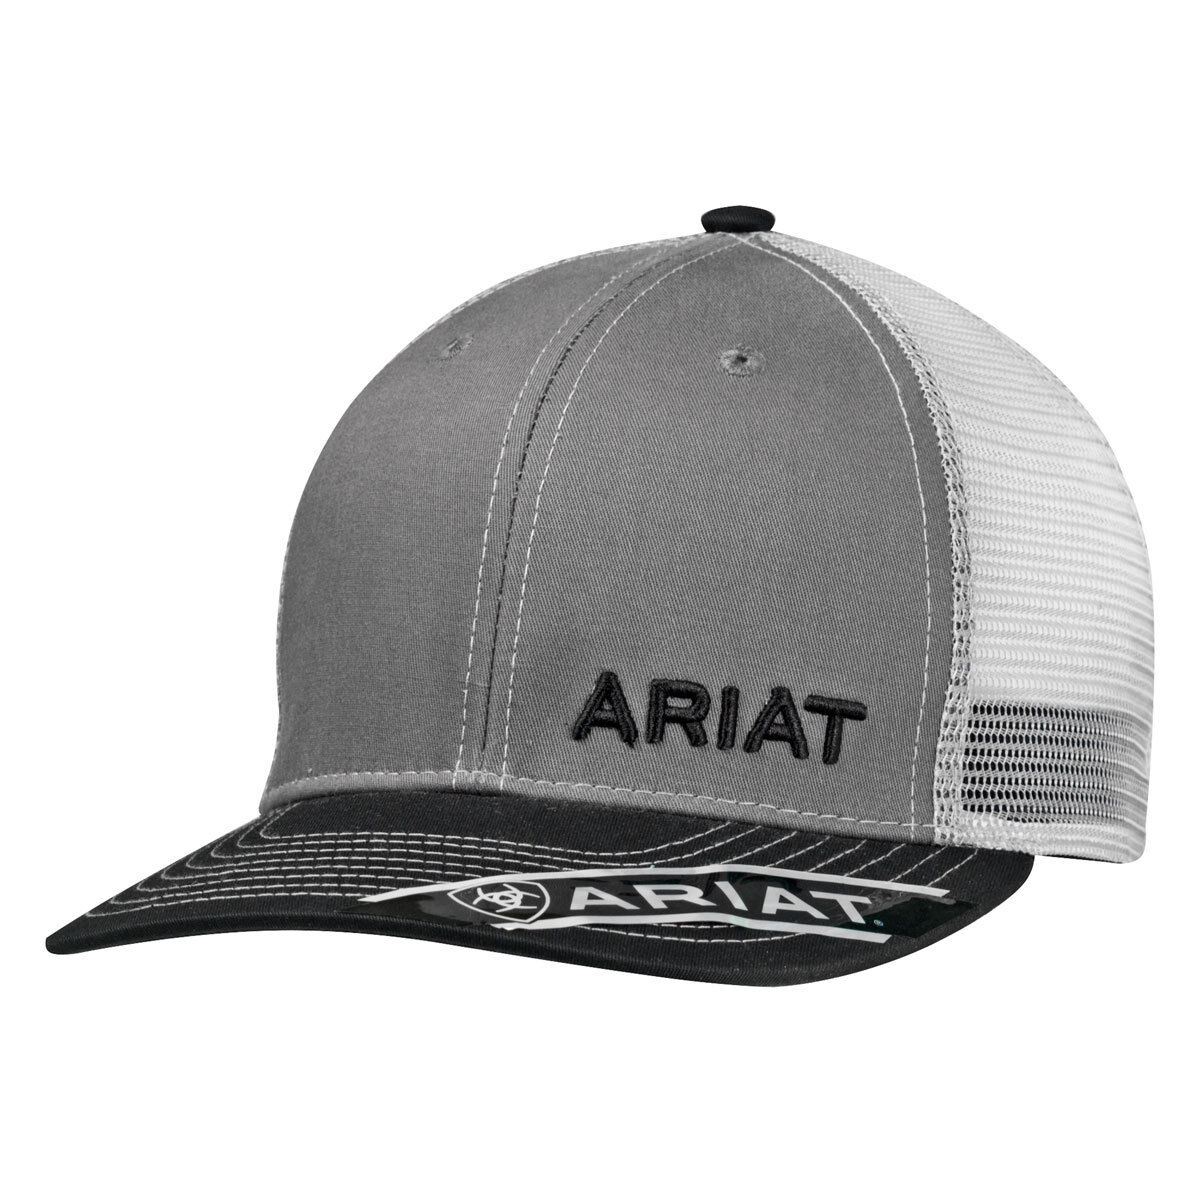 d9db5661a17709 ... black a7153 db49b canada ariat mens cap grey one size adjustable 7 post  snap closure medium structured profile 6 ...